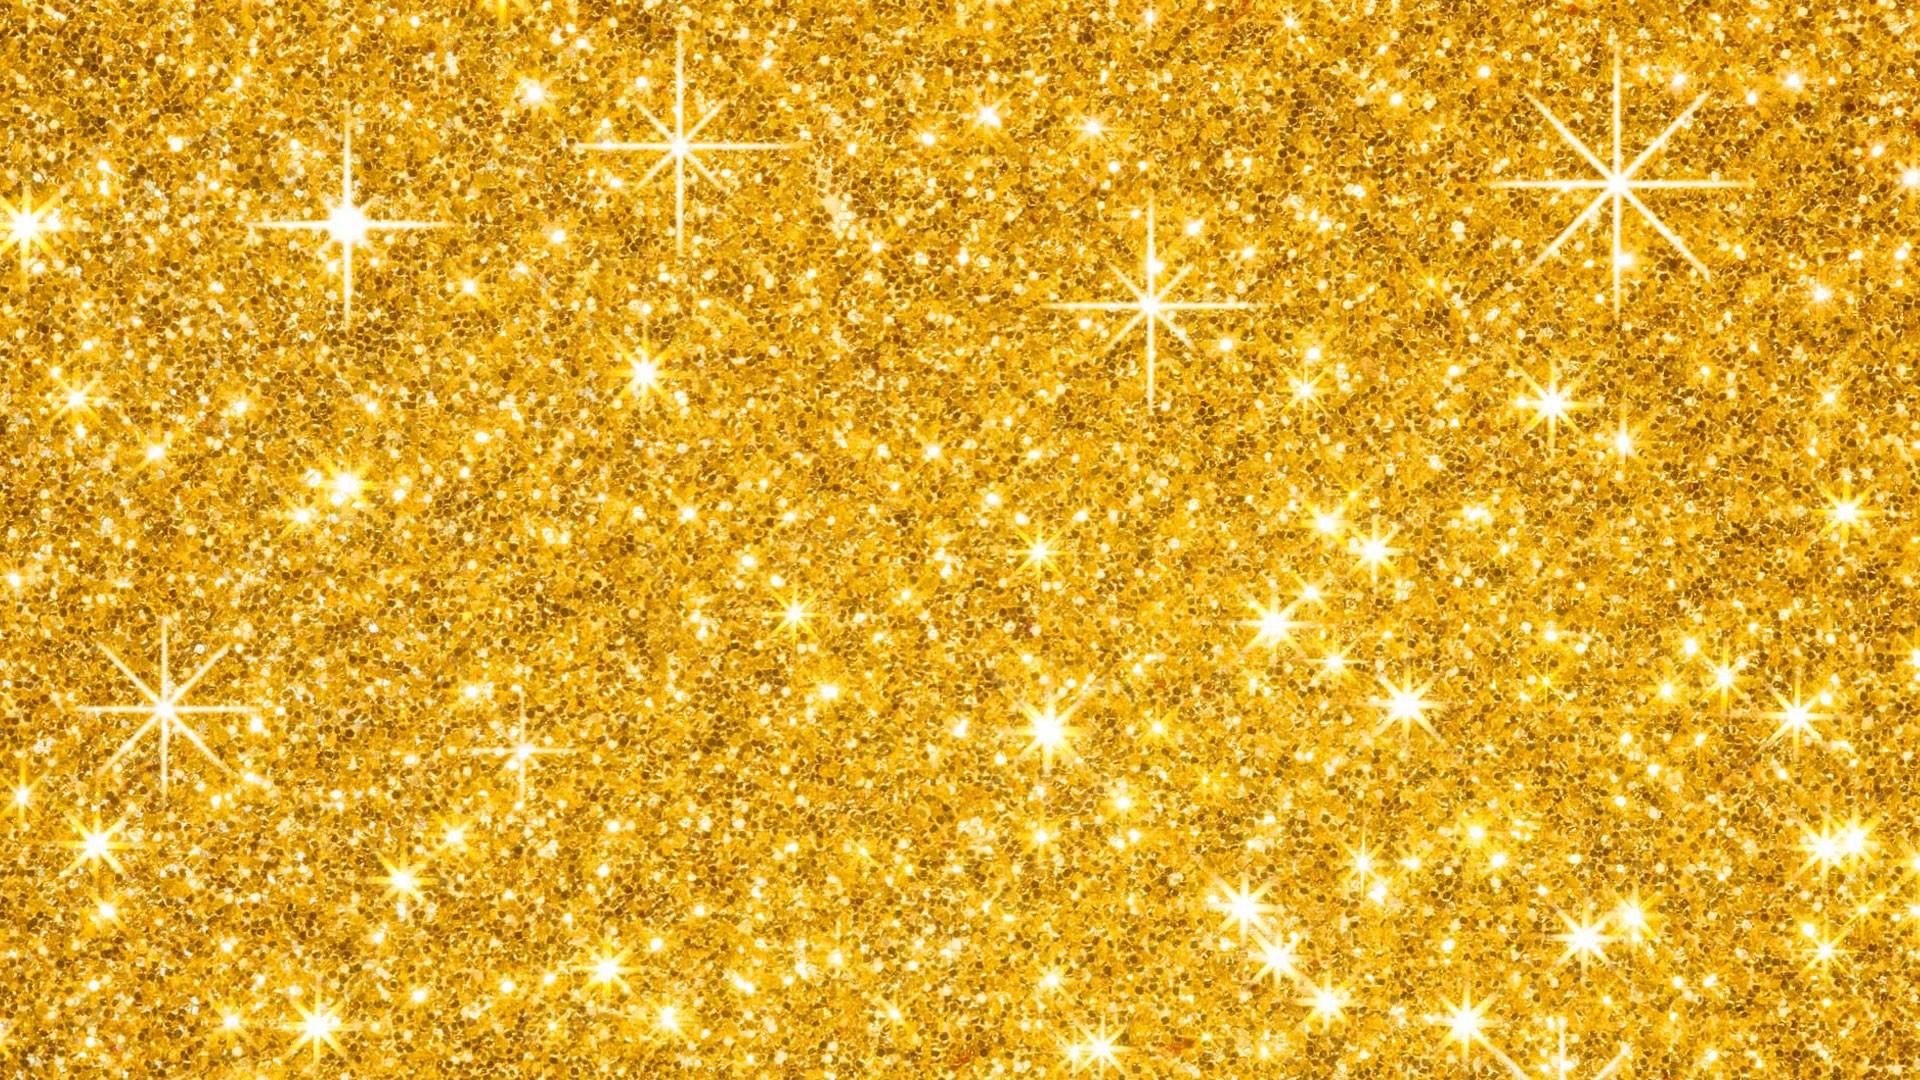 Best Wallpaper Home Screen Glitter - 123698-cool-gold-sparkle-background-1920x1080  Trends_82177.jpg